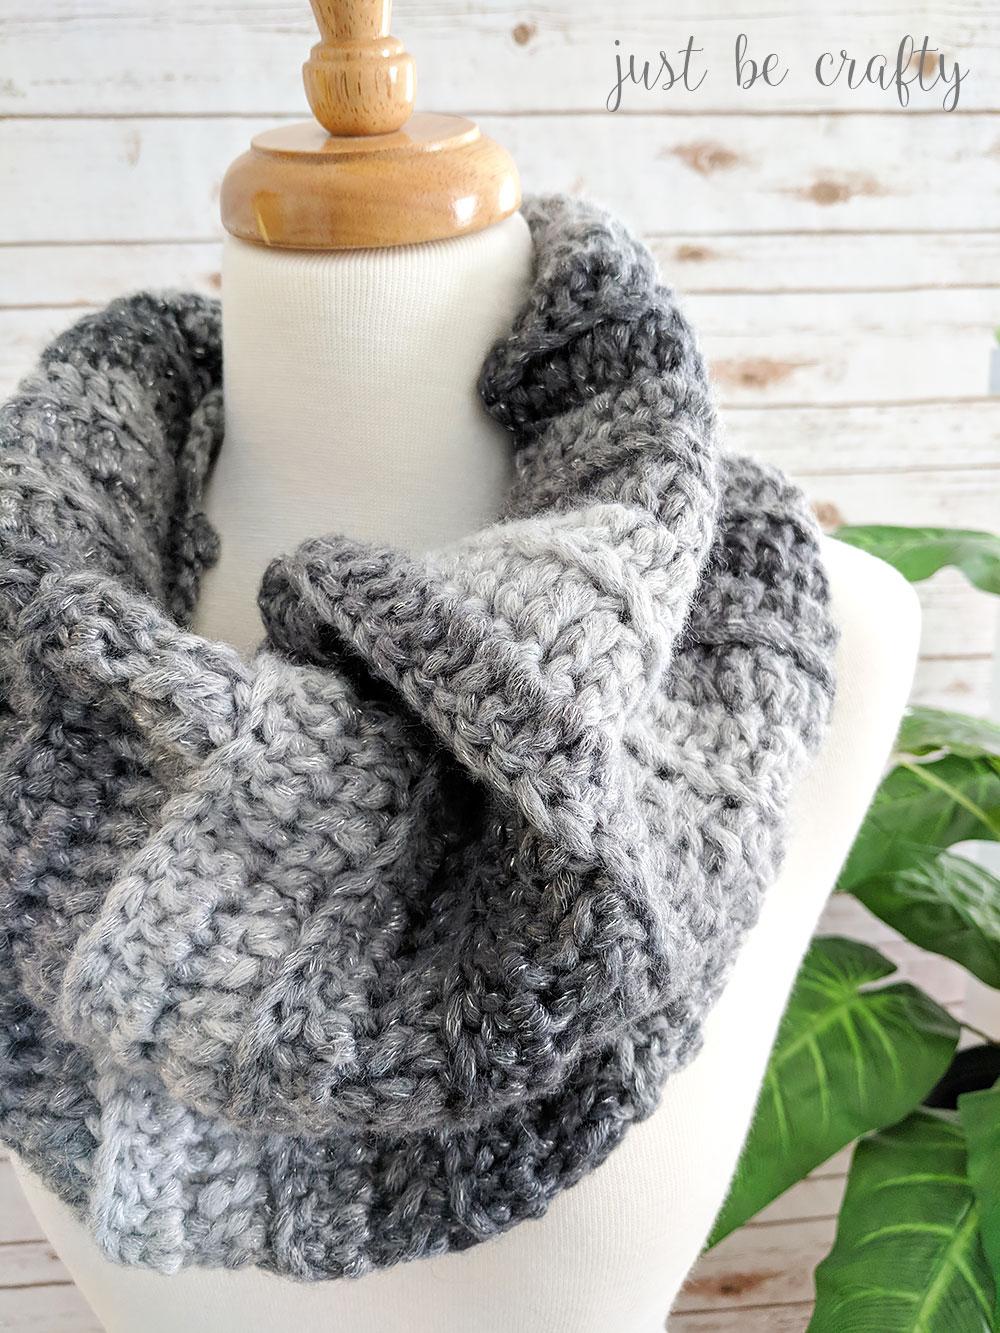 Stormy-Night-Crochet-Ribbed-Cowl